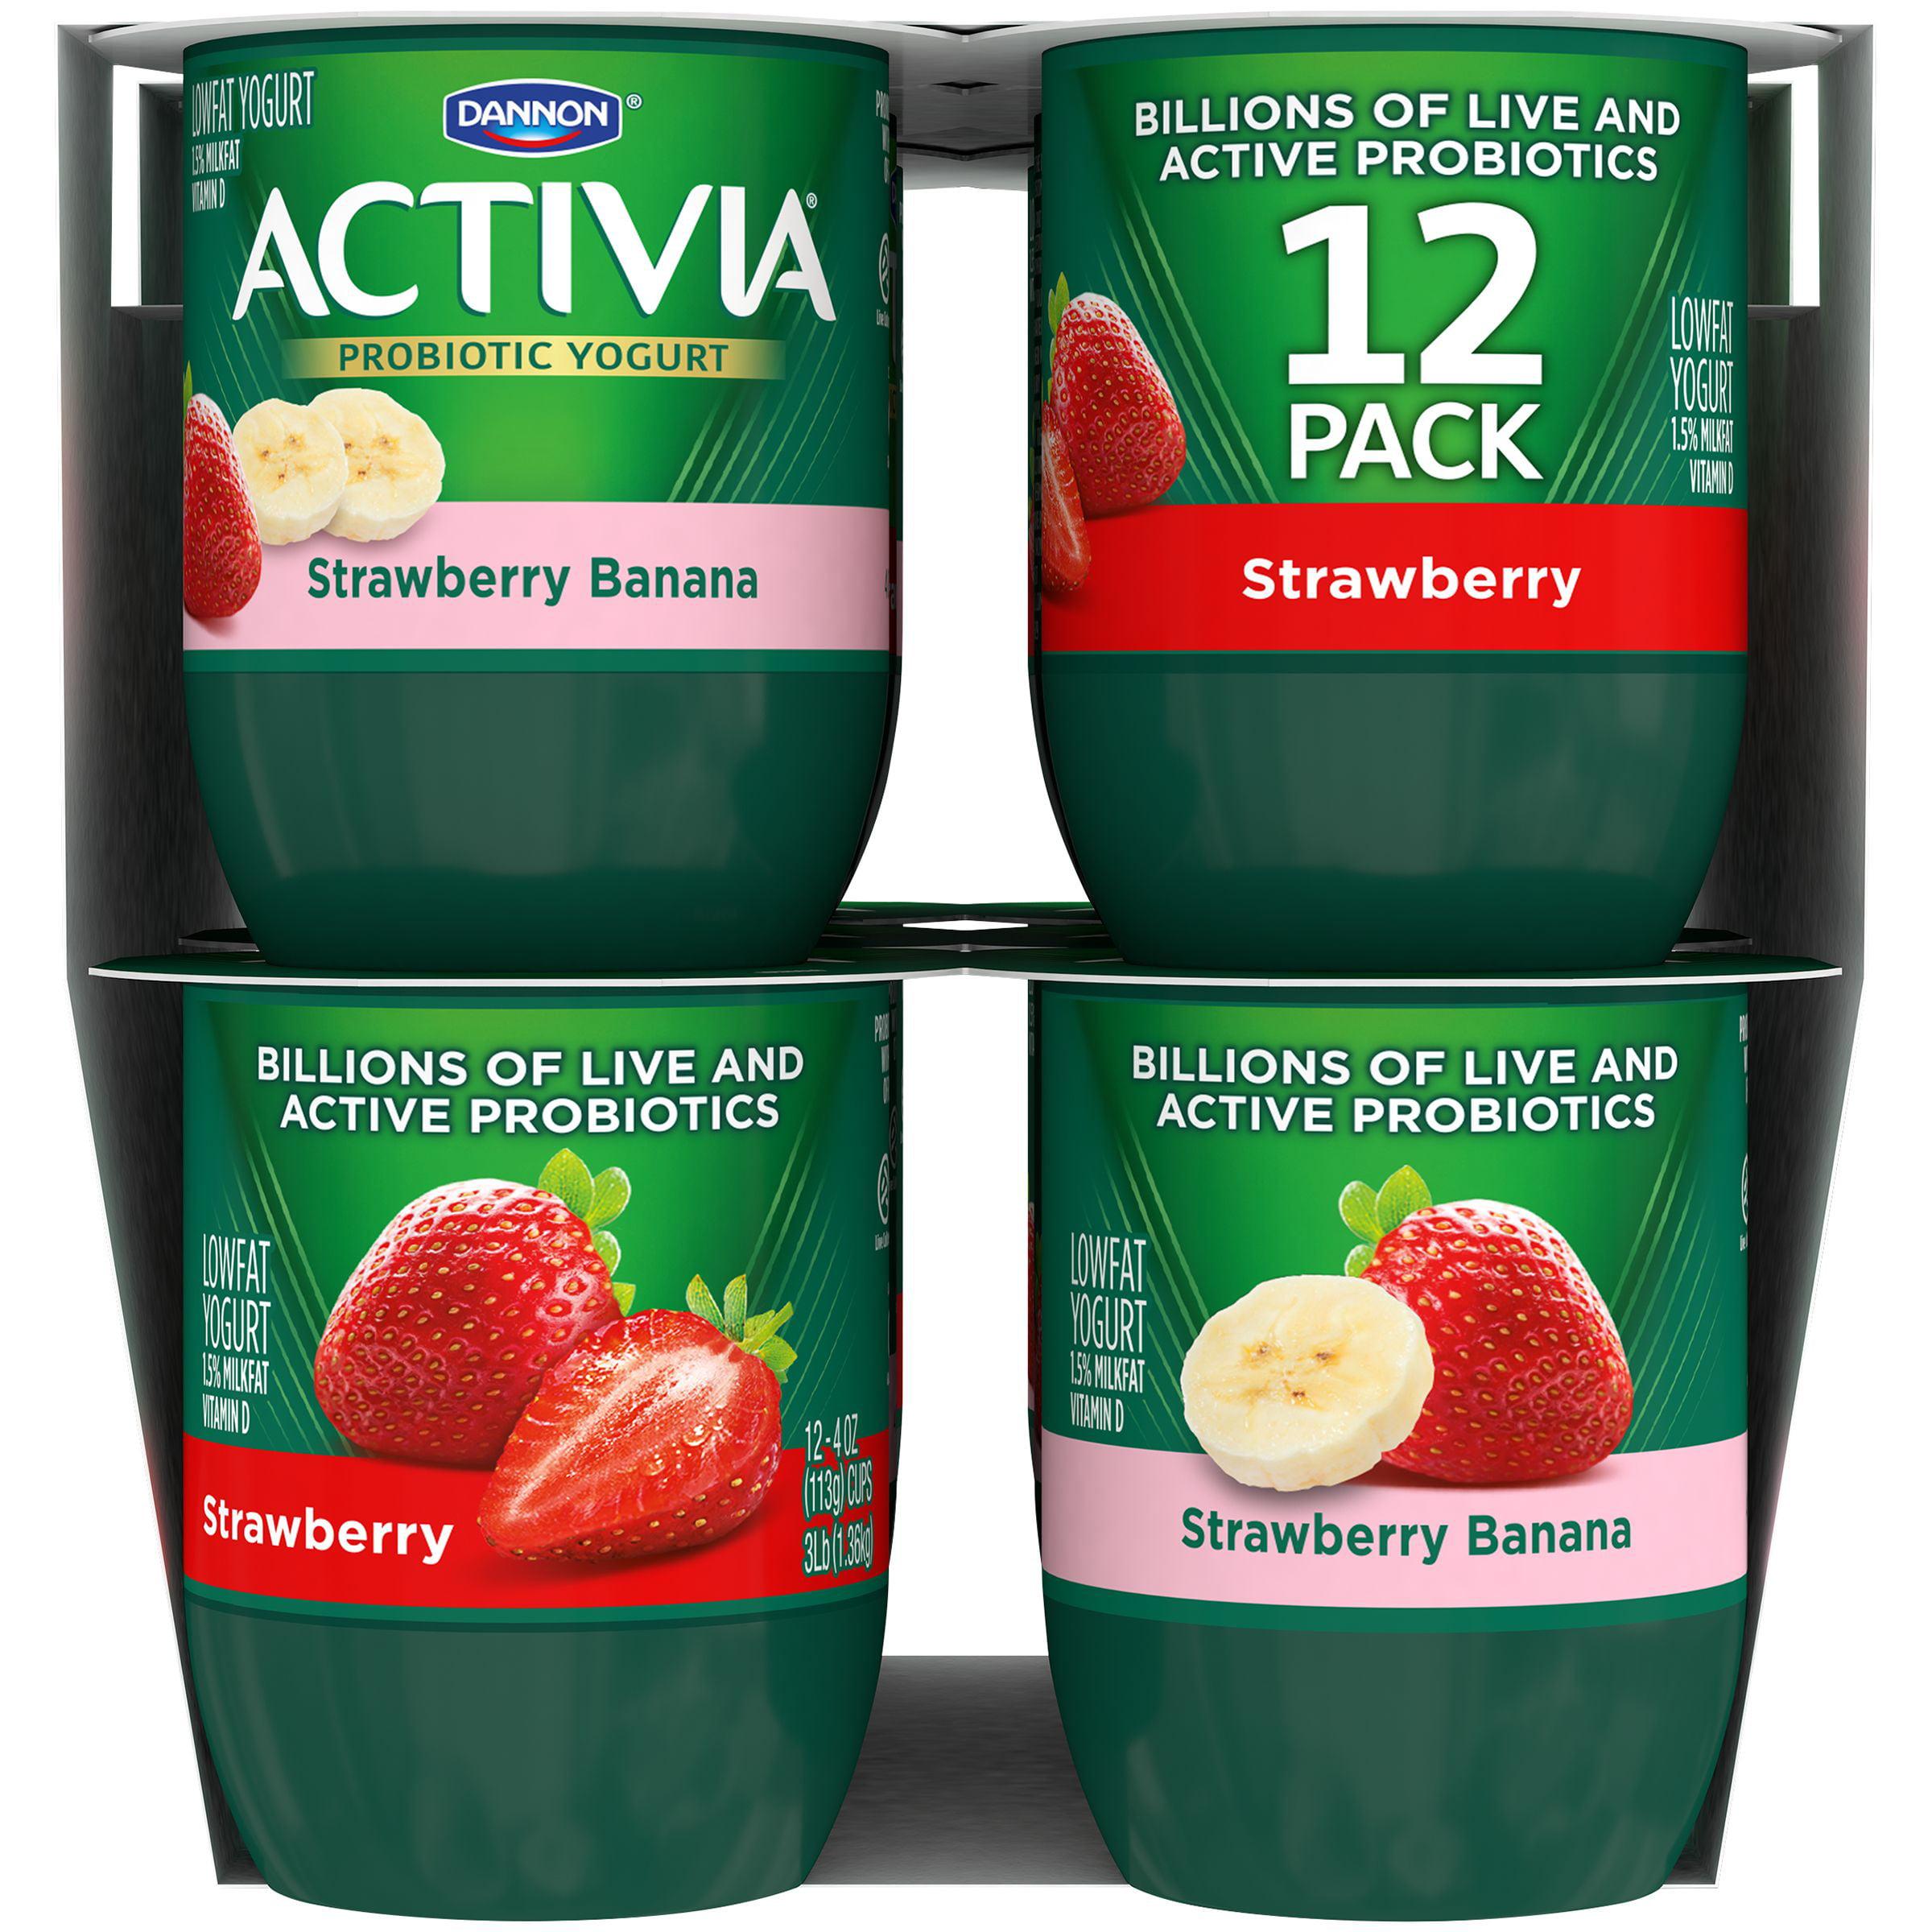 Activia Lowfat Strawberry/Strawberry Banana Probiotic Yogurt, 4 oz, 12 count - Walmart.com